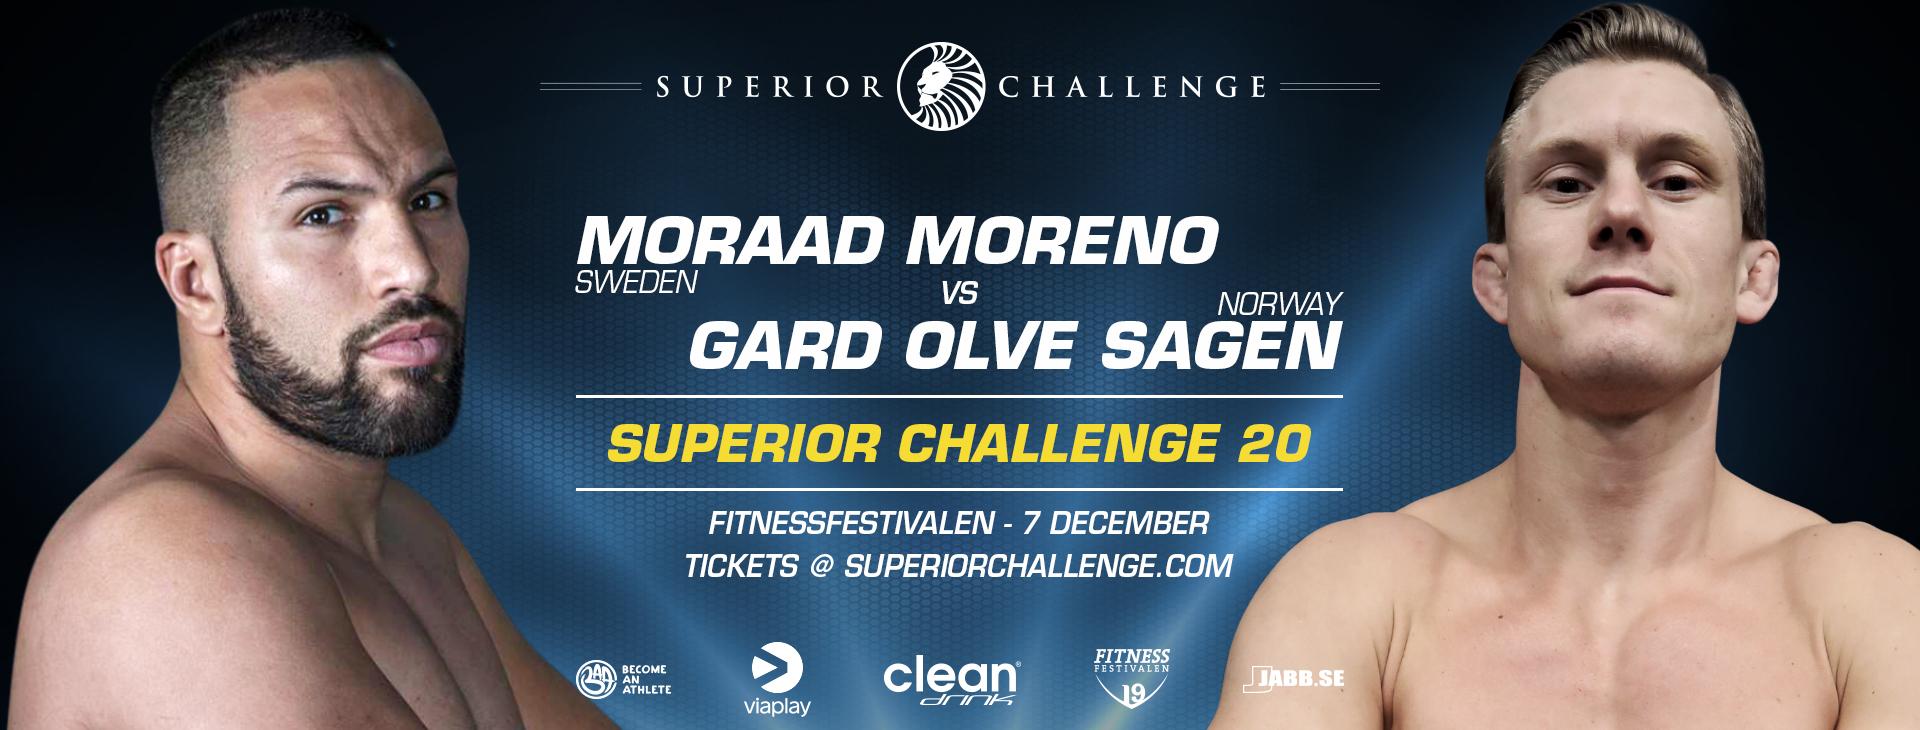 Mooard Moreno vs Gard Olve Sagen at Superior Challenge 20 - Fitnessfestivalen